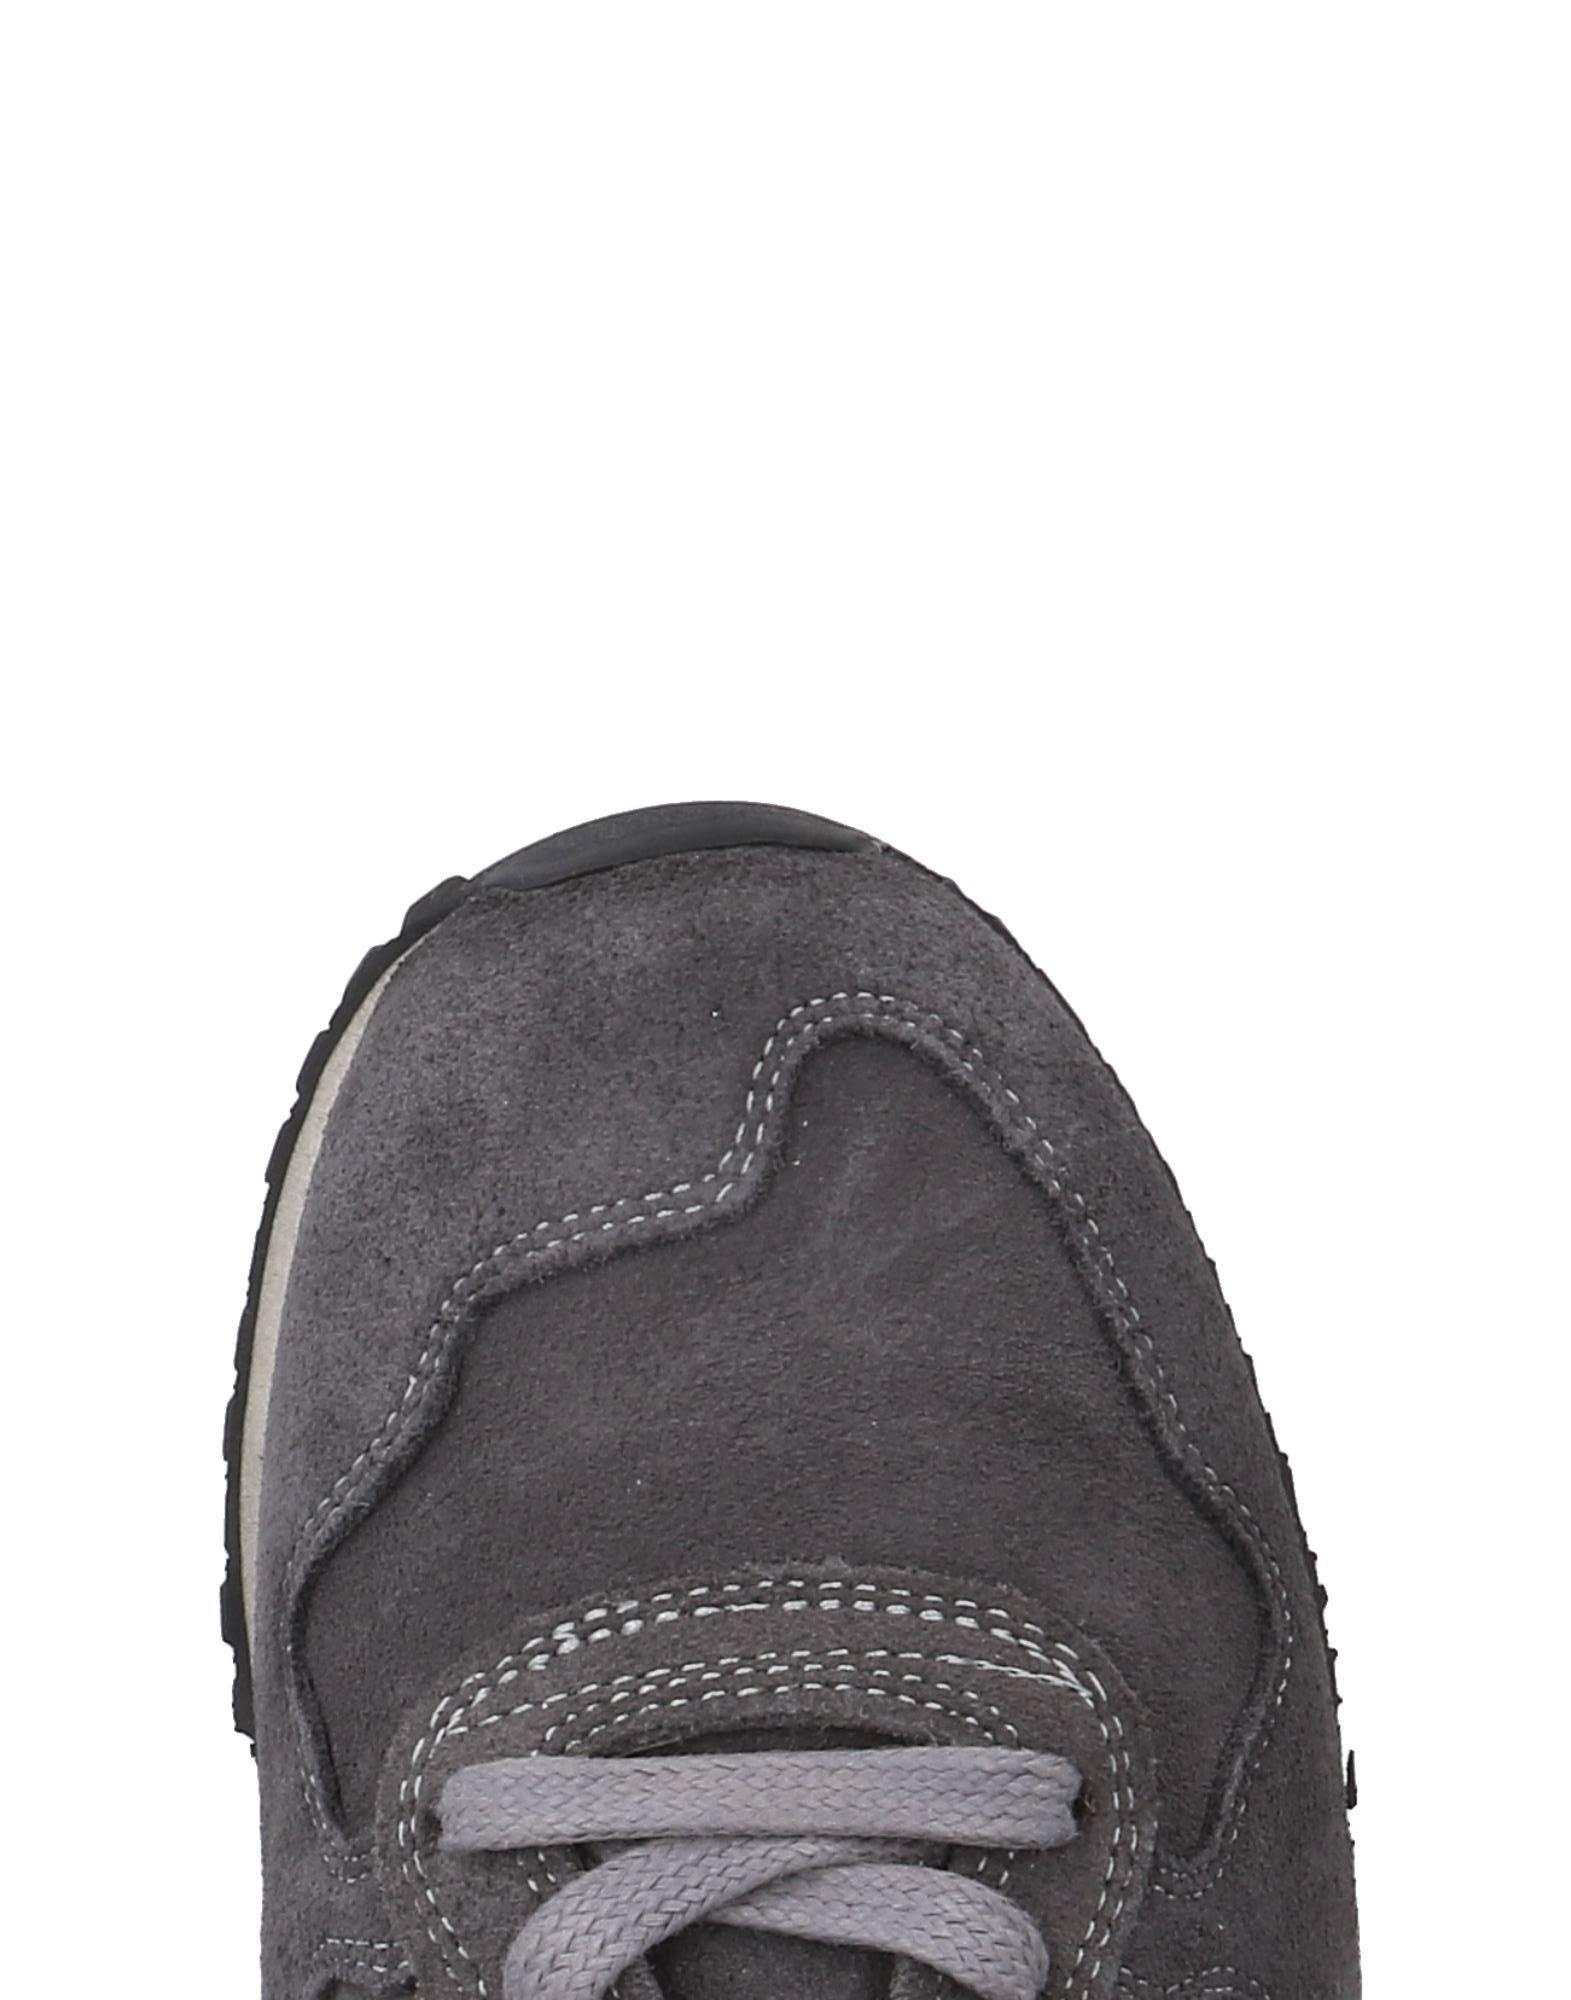 11499207TO Diadora Sneakers Herren  11499207TO  2da3bb